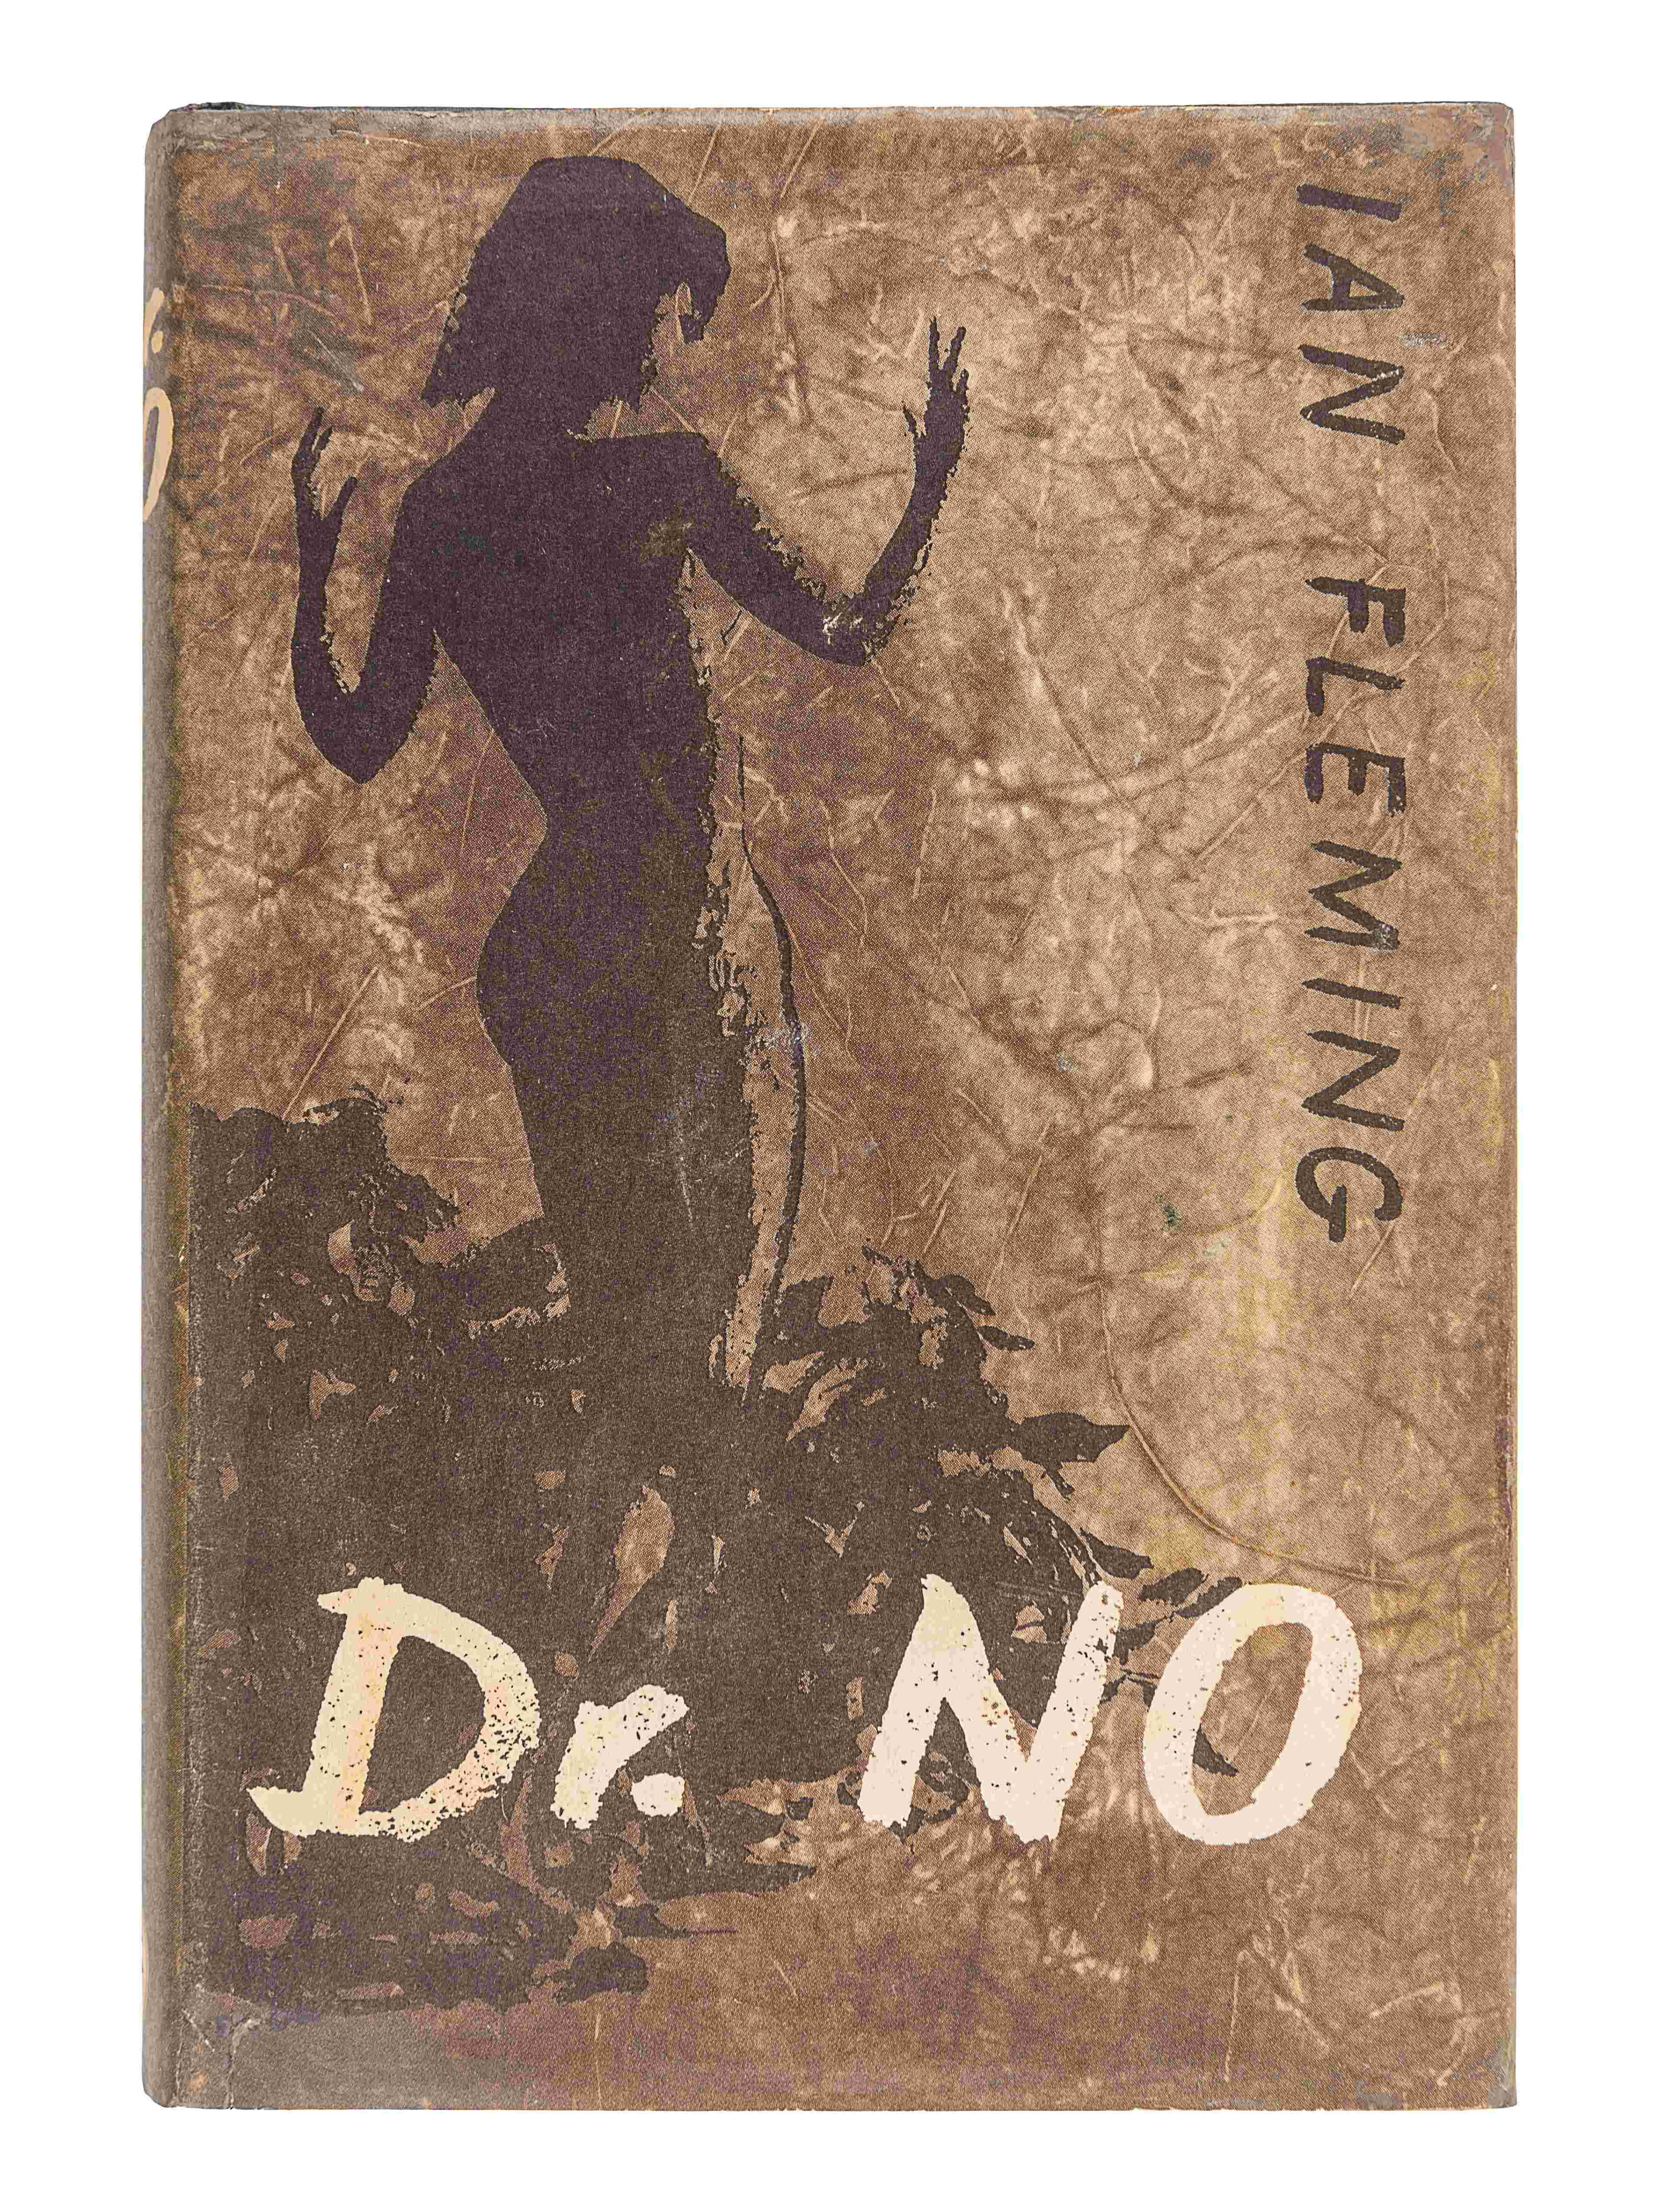 FLEMING, Ian (1908-1964). Dr. No. London: Jonathan Cape, 1958. - Image 3 of 3